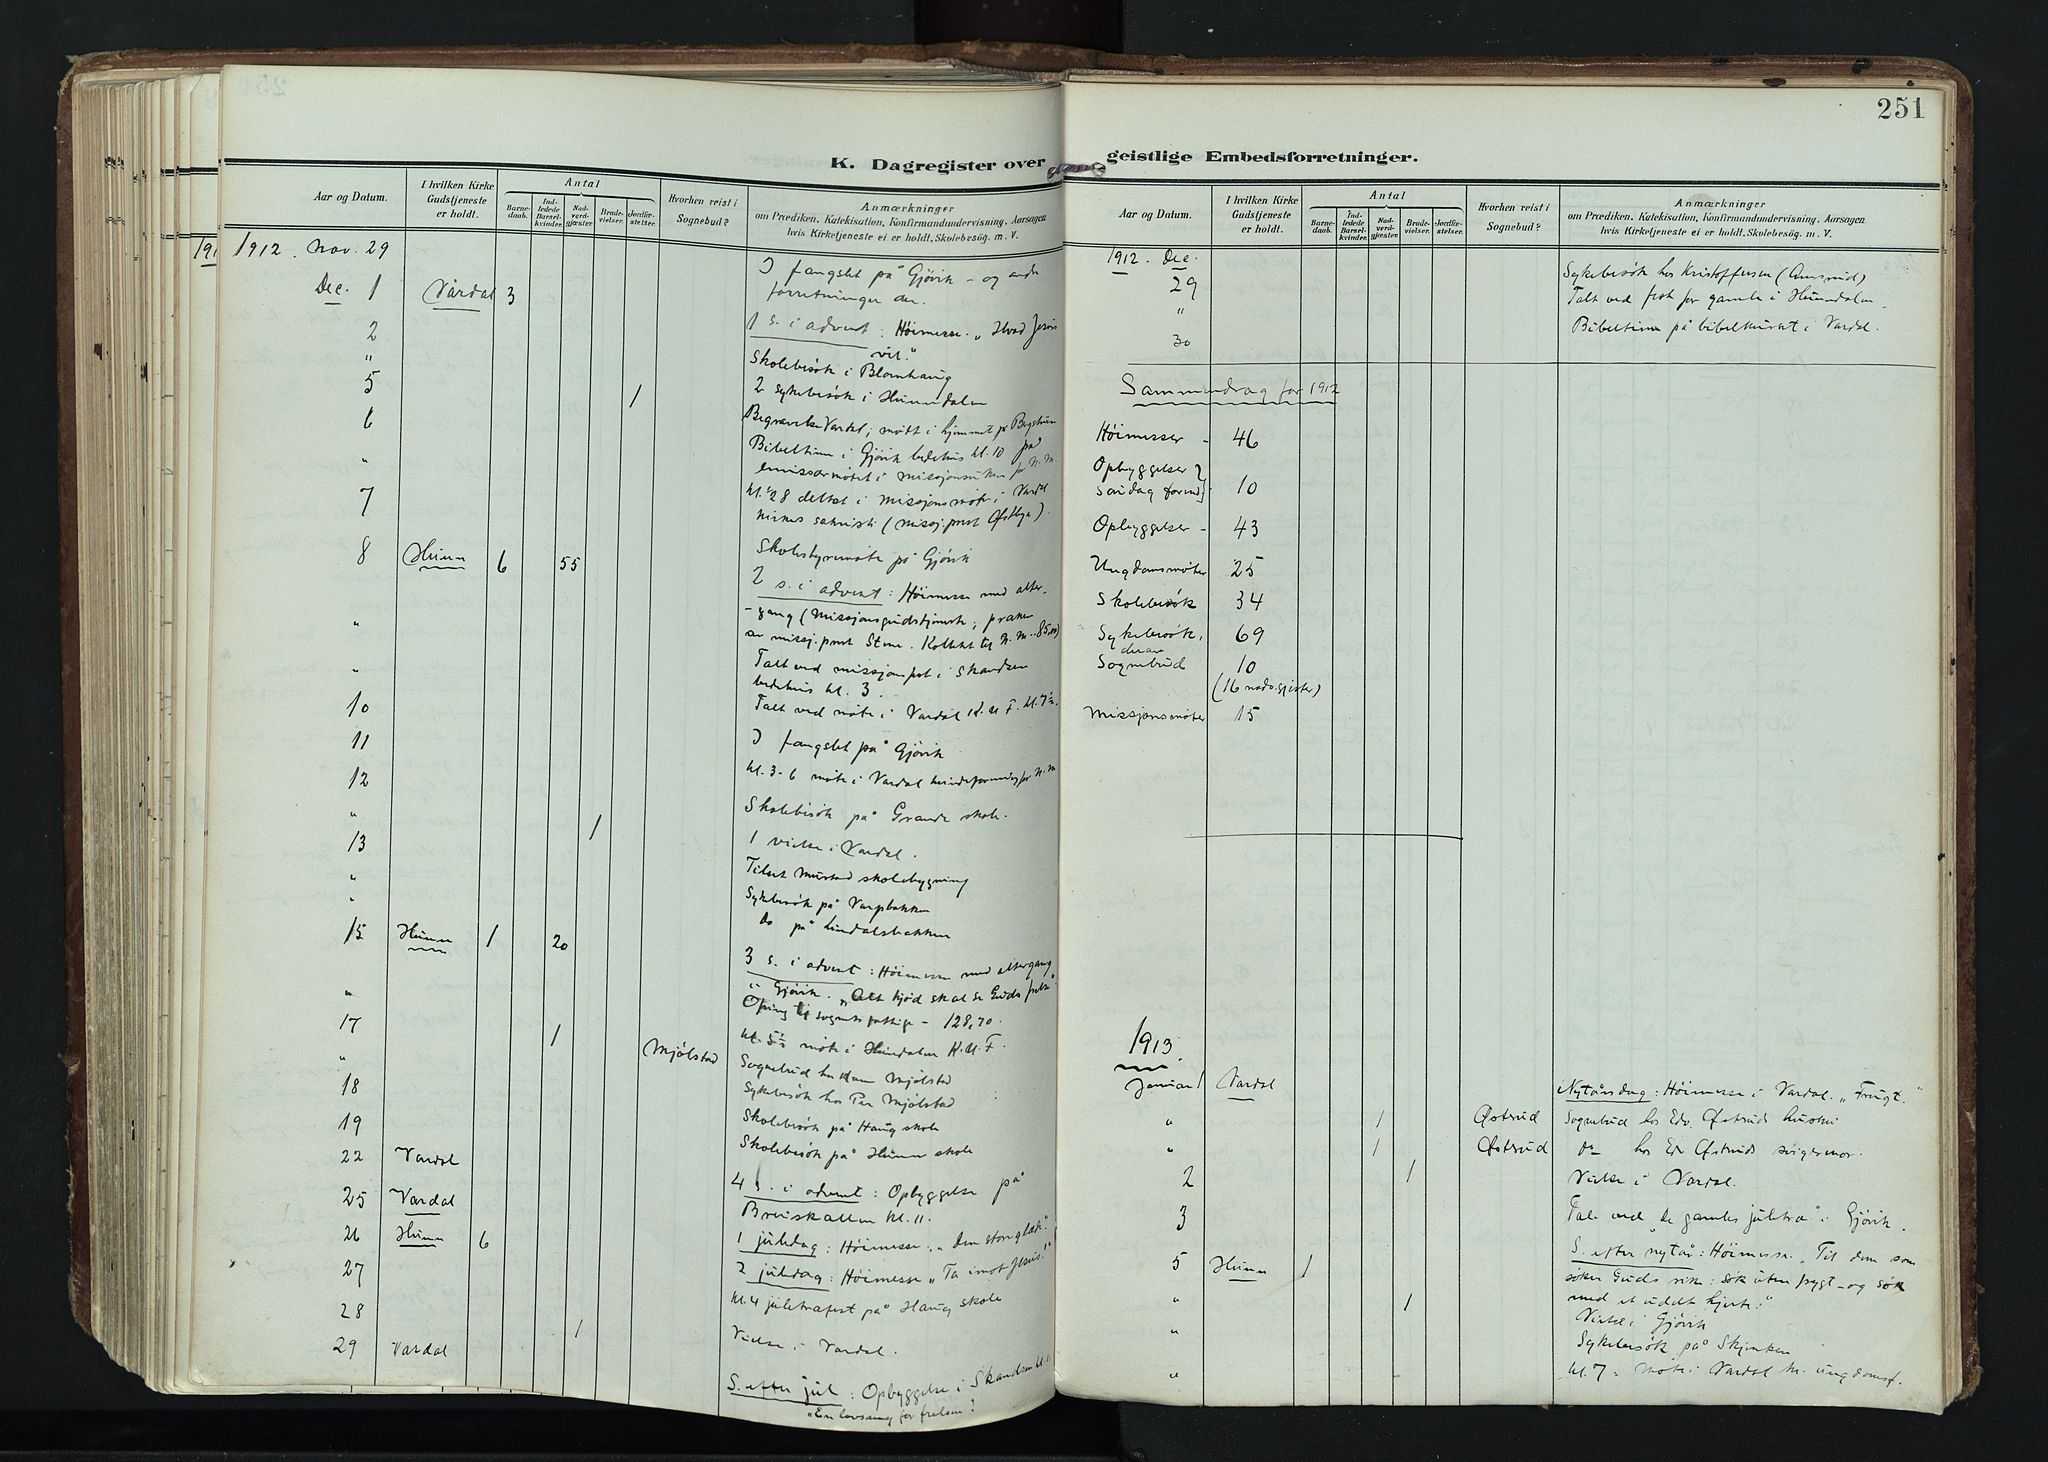 SAH, Vardal prestekontor, H/Ha/Haa/L0020: Ministerialbok nr. 20, 1907-1921, s. 251